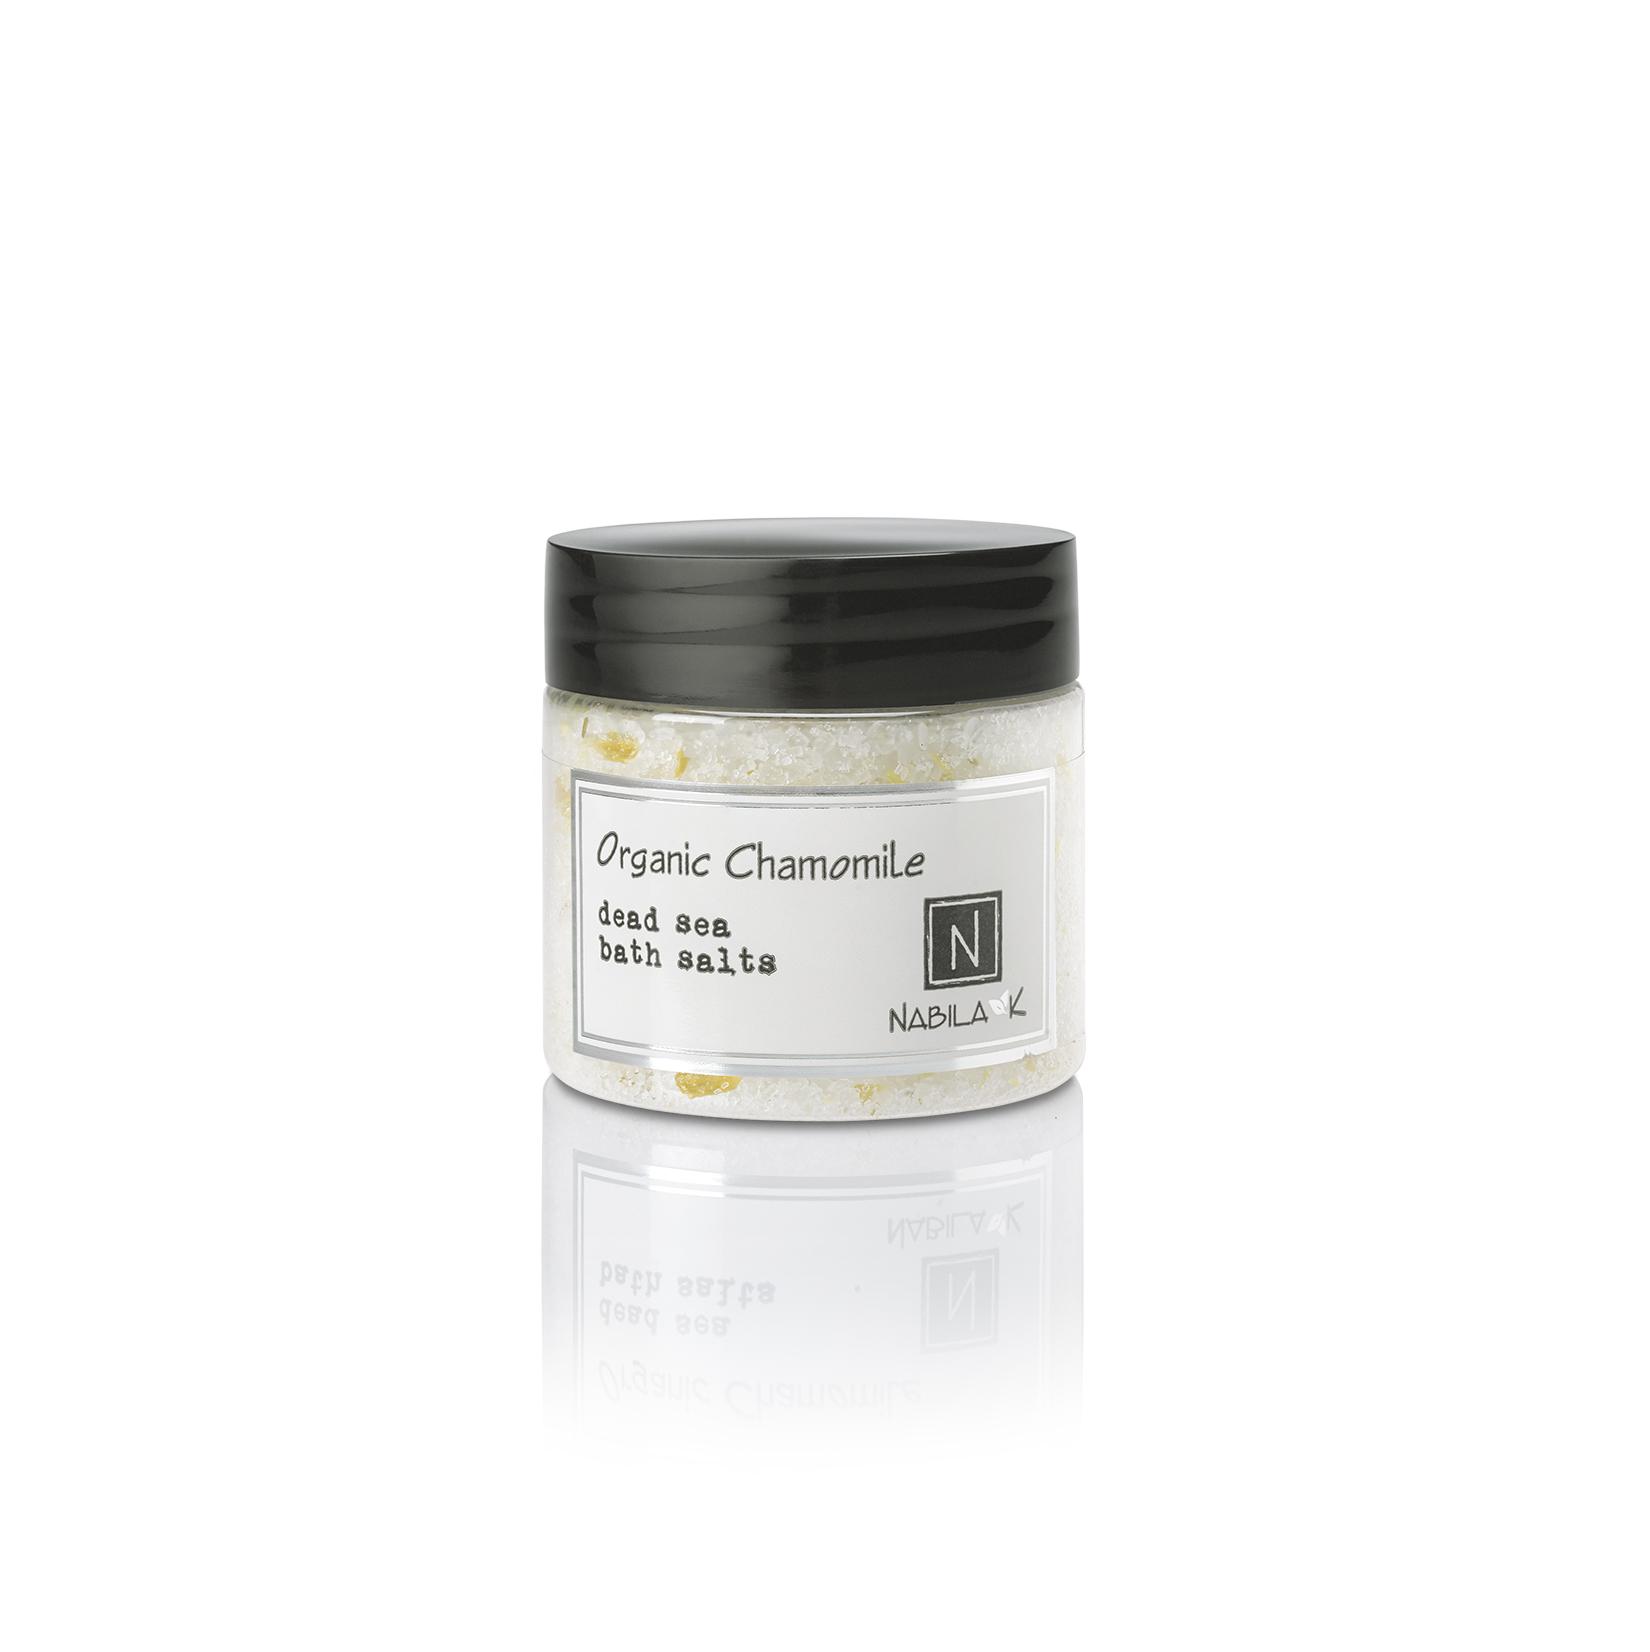 Travel Sized Version of Nabila K's Organic Chamomile Dead Sea Bath Salts